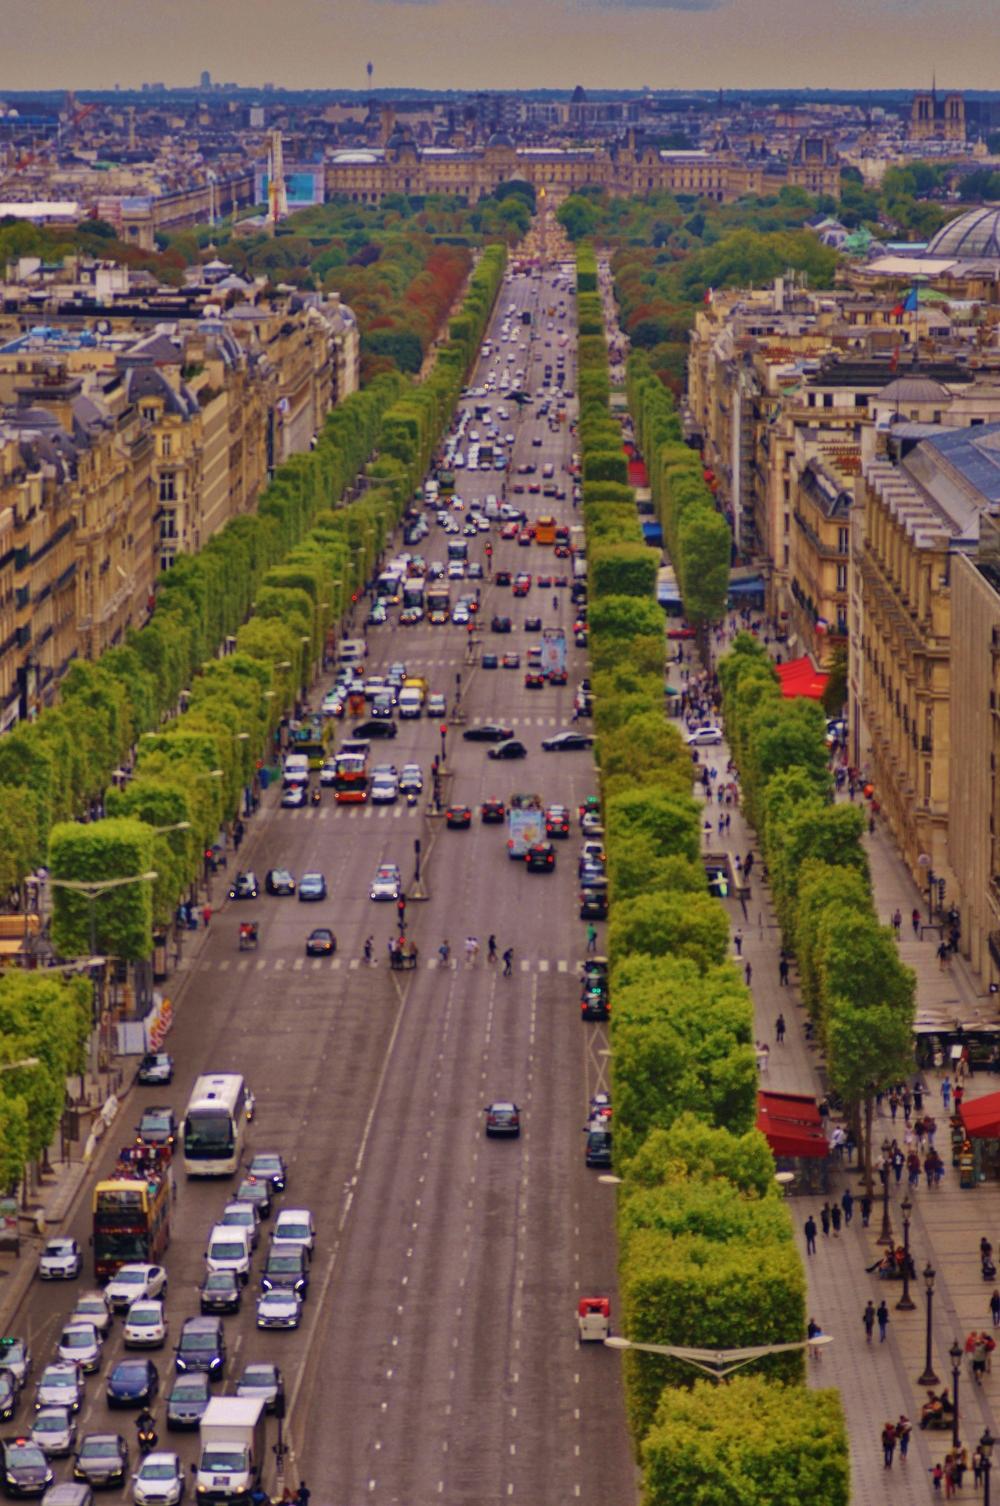 Paris_(14).jpg